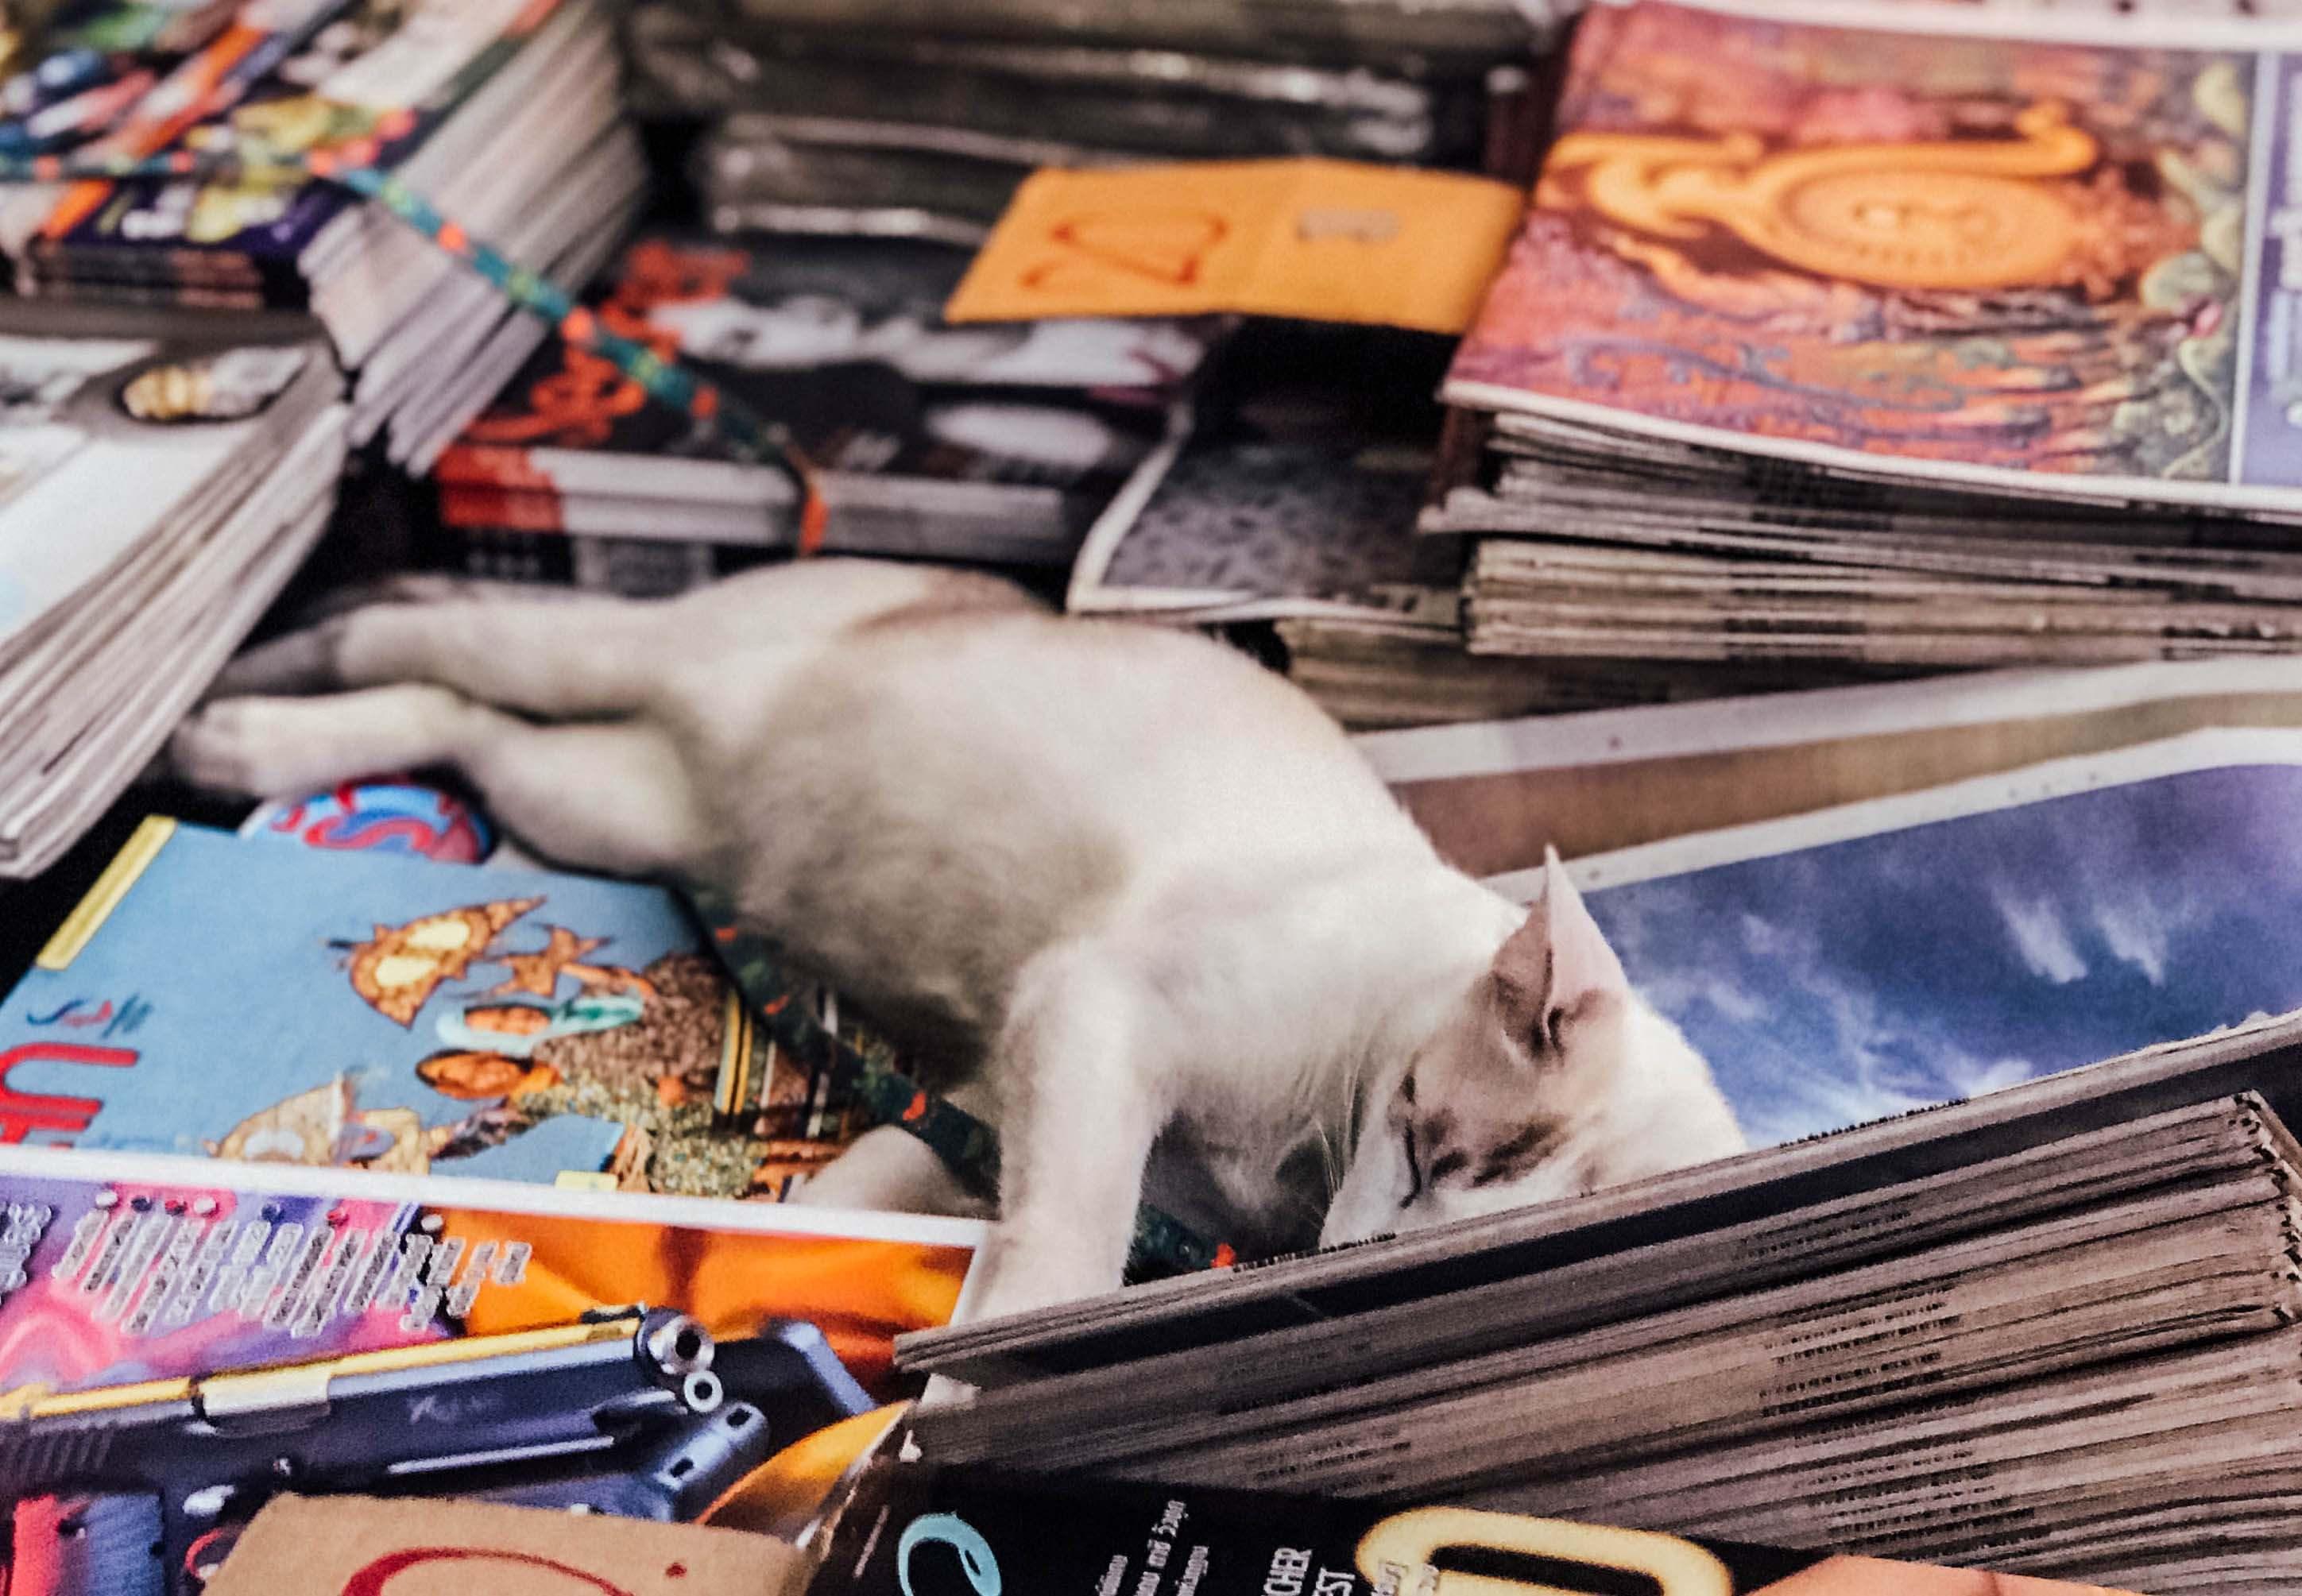 Cat sleeping on magazines in Bangkok.